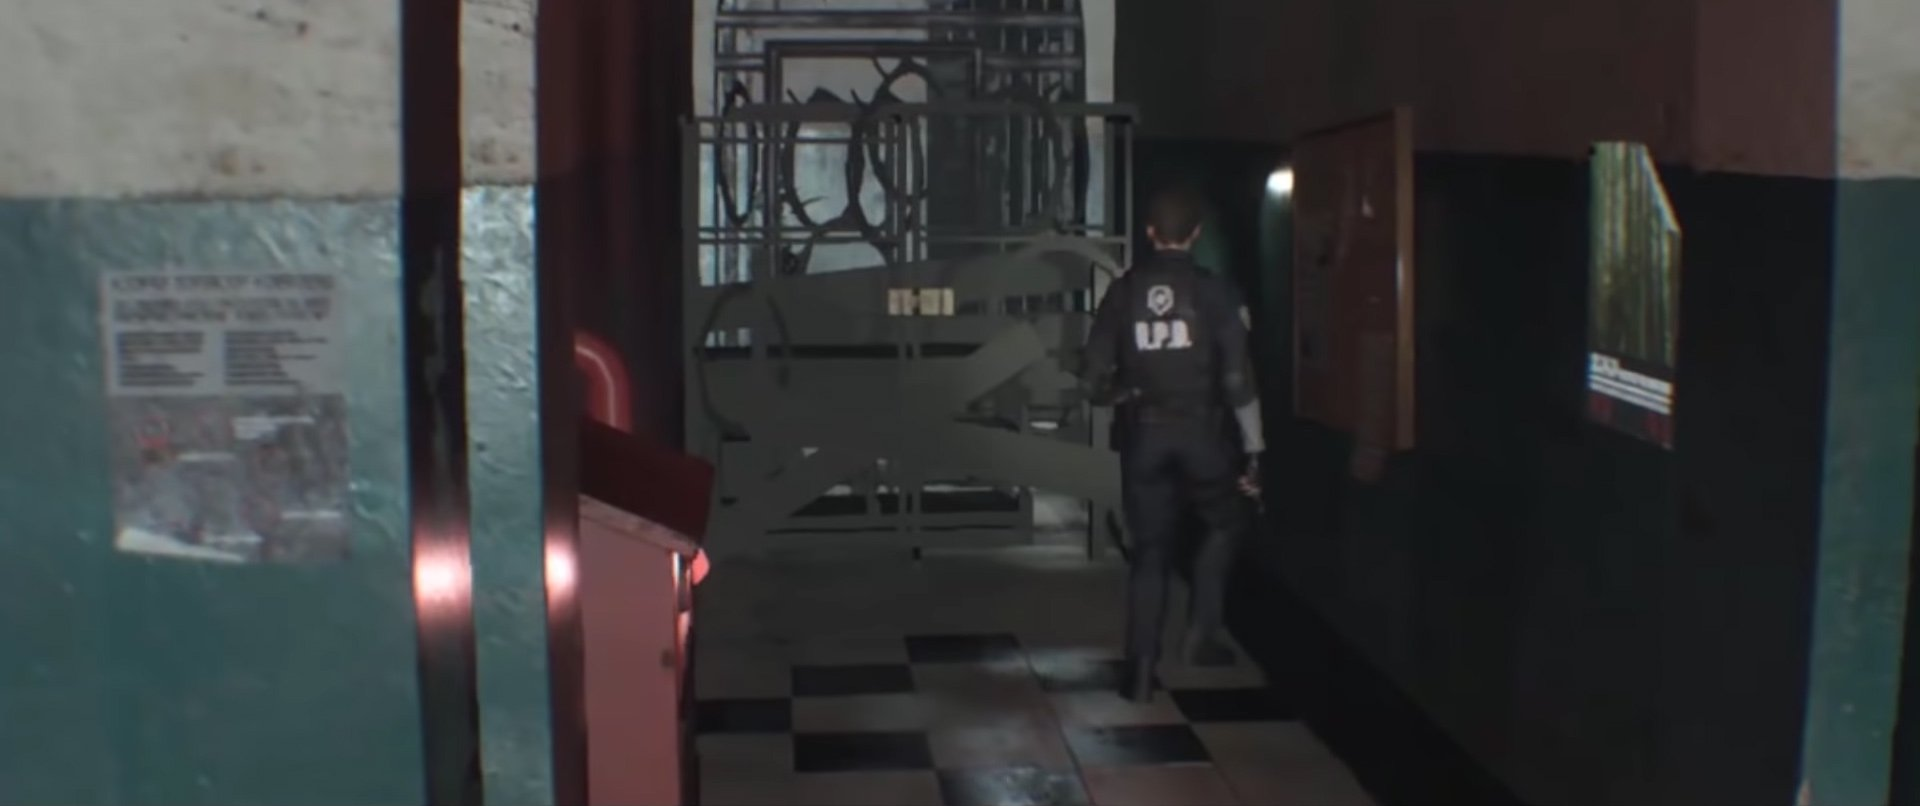 Resident Evil 2 cut content - fixed camera